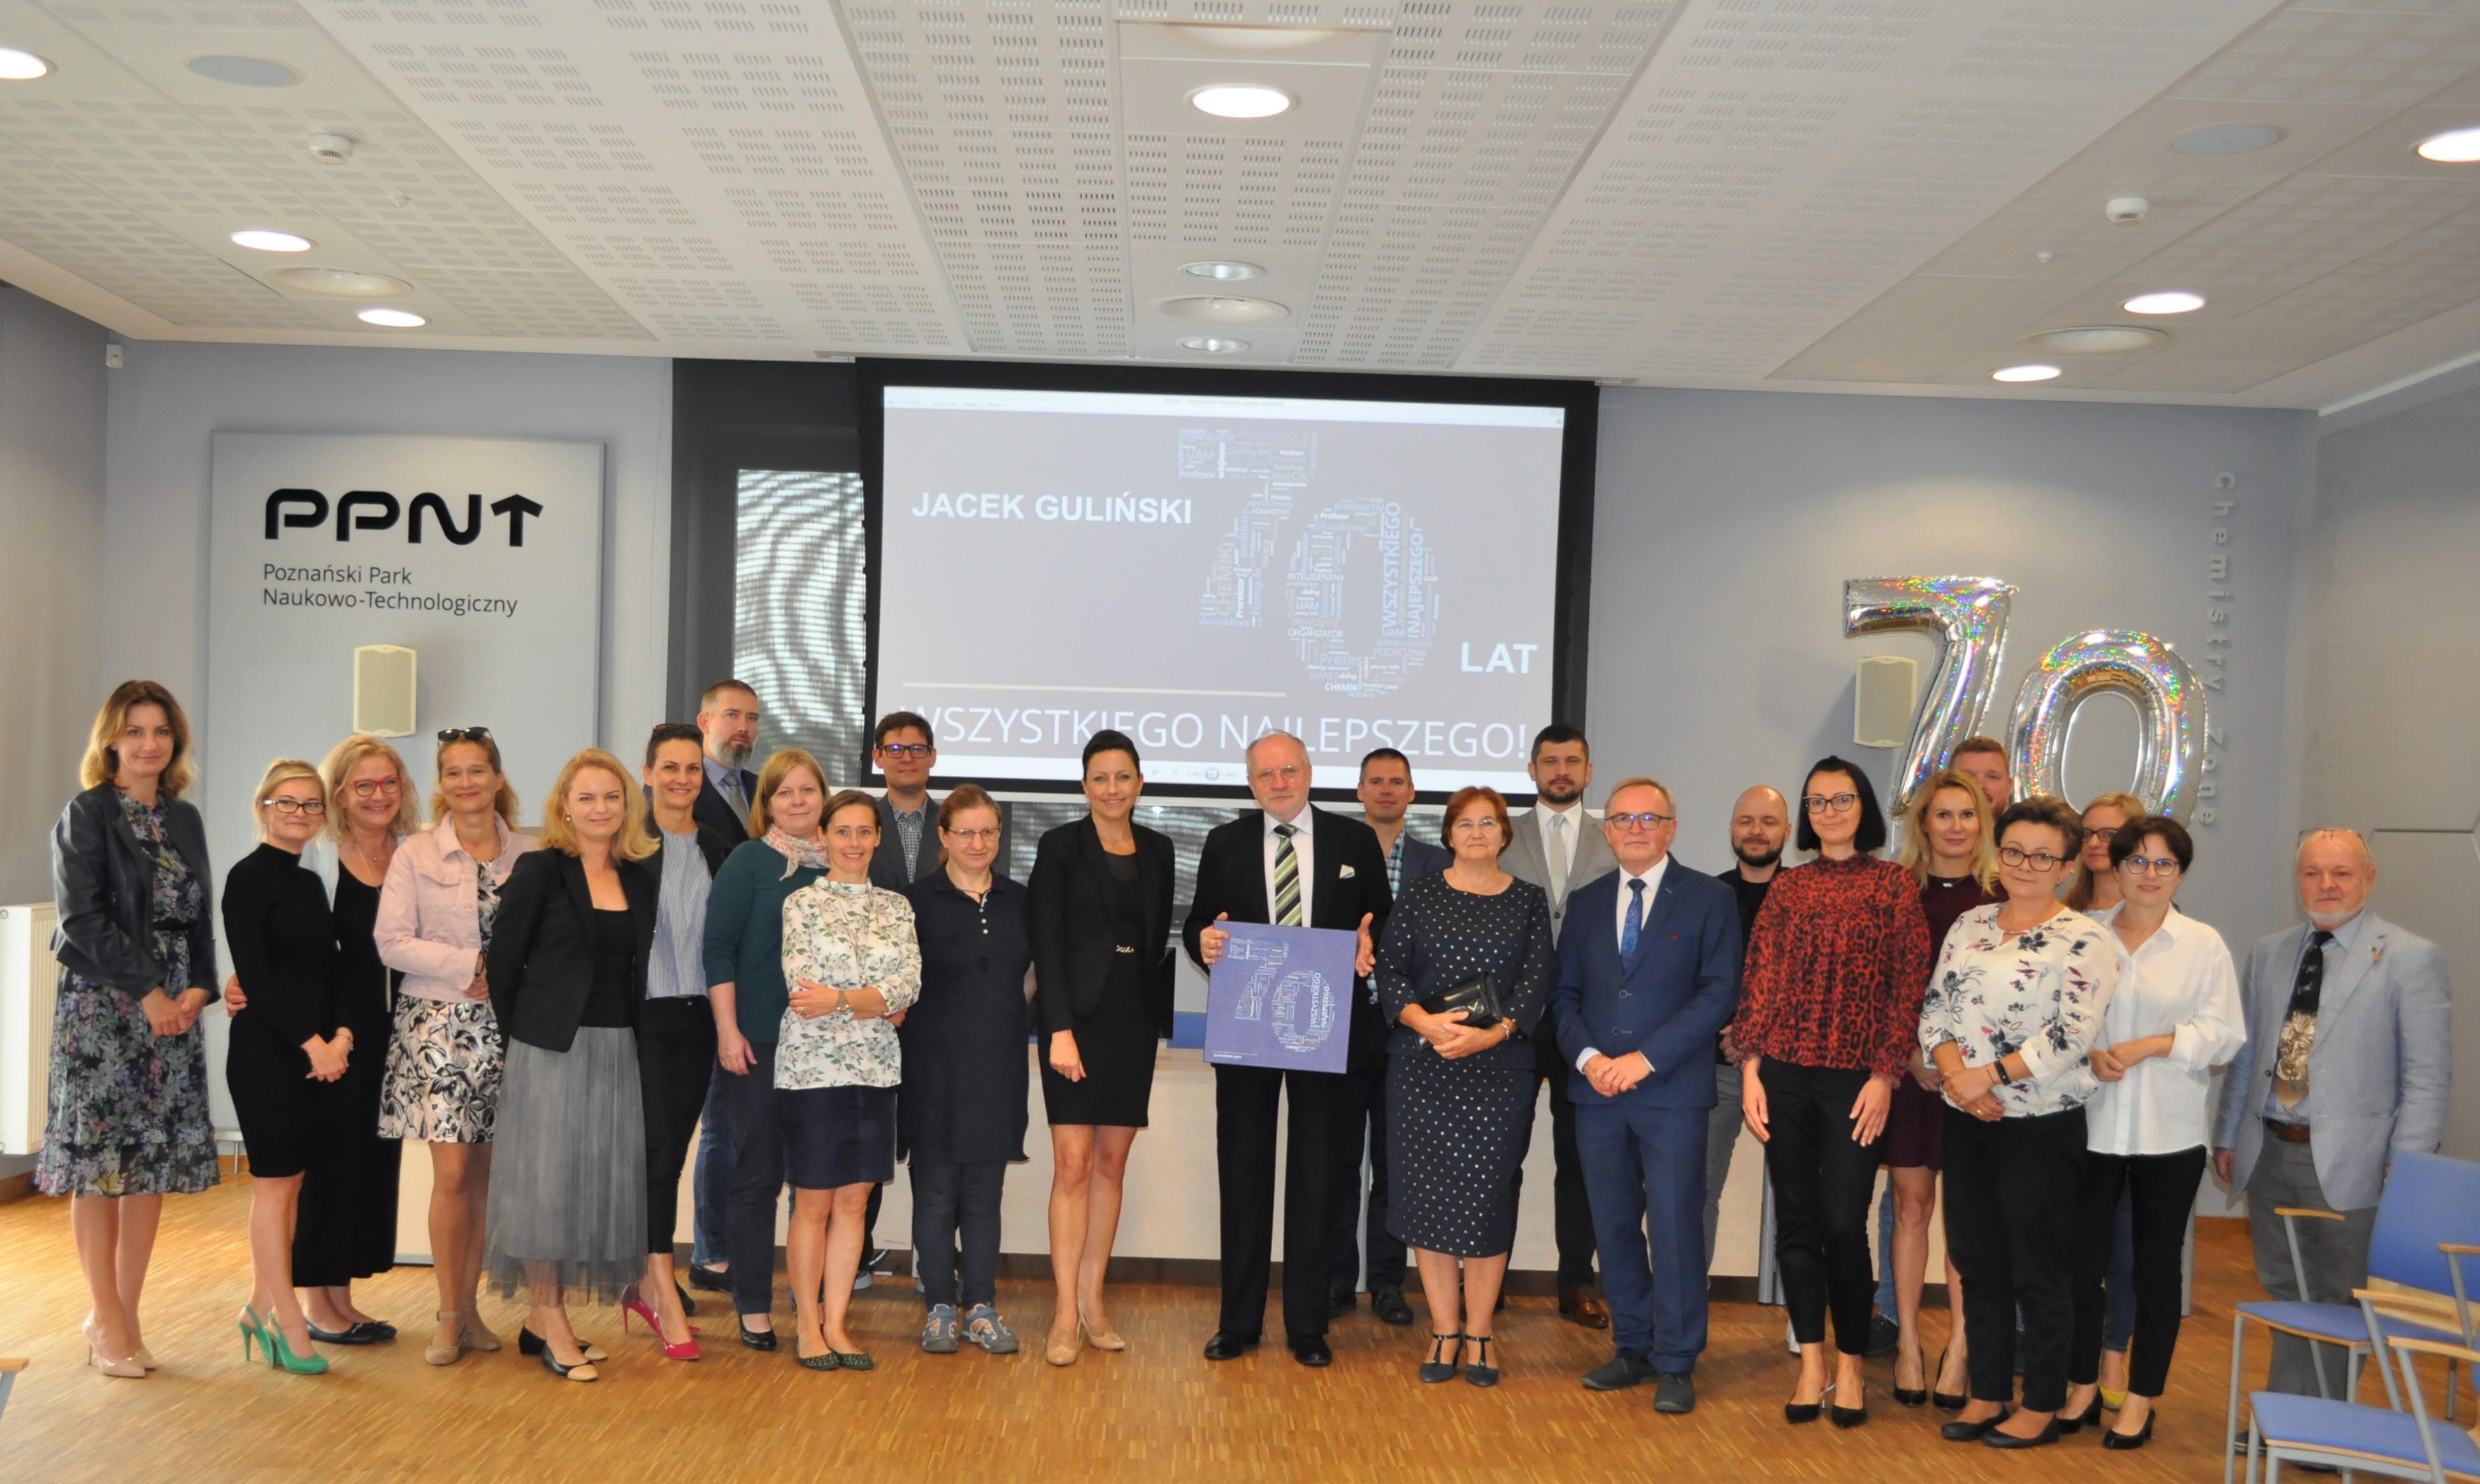 Medal Homini Vere Academico, spotkanie po 50 latach – jubileusz prof. Jacka Gulińskiego